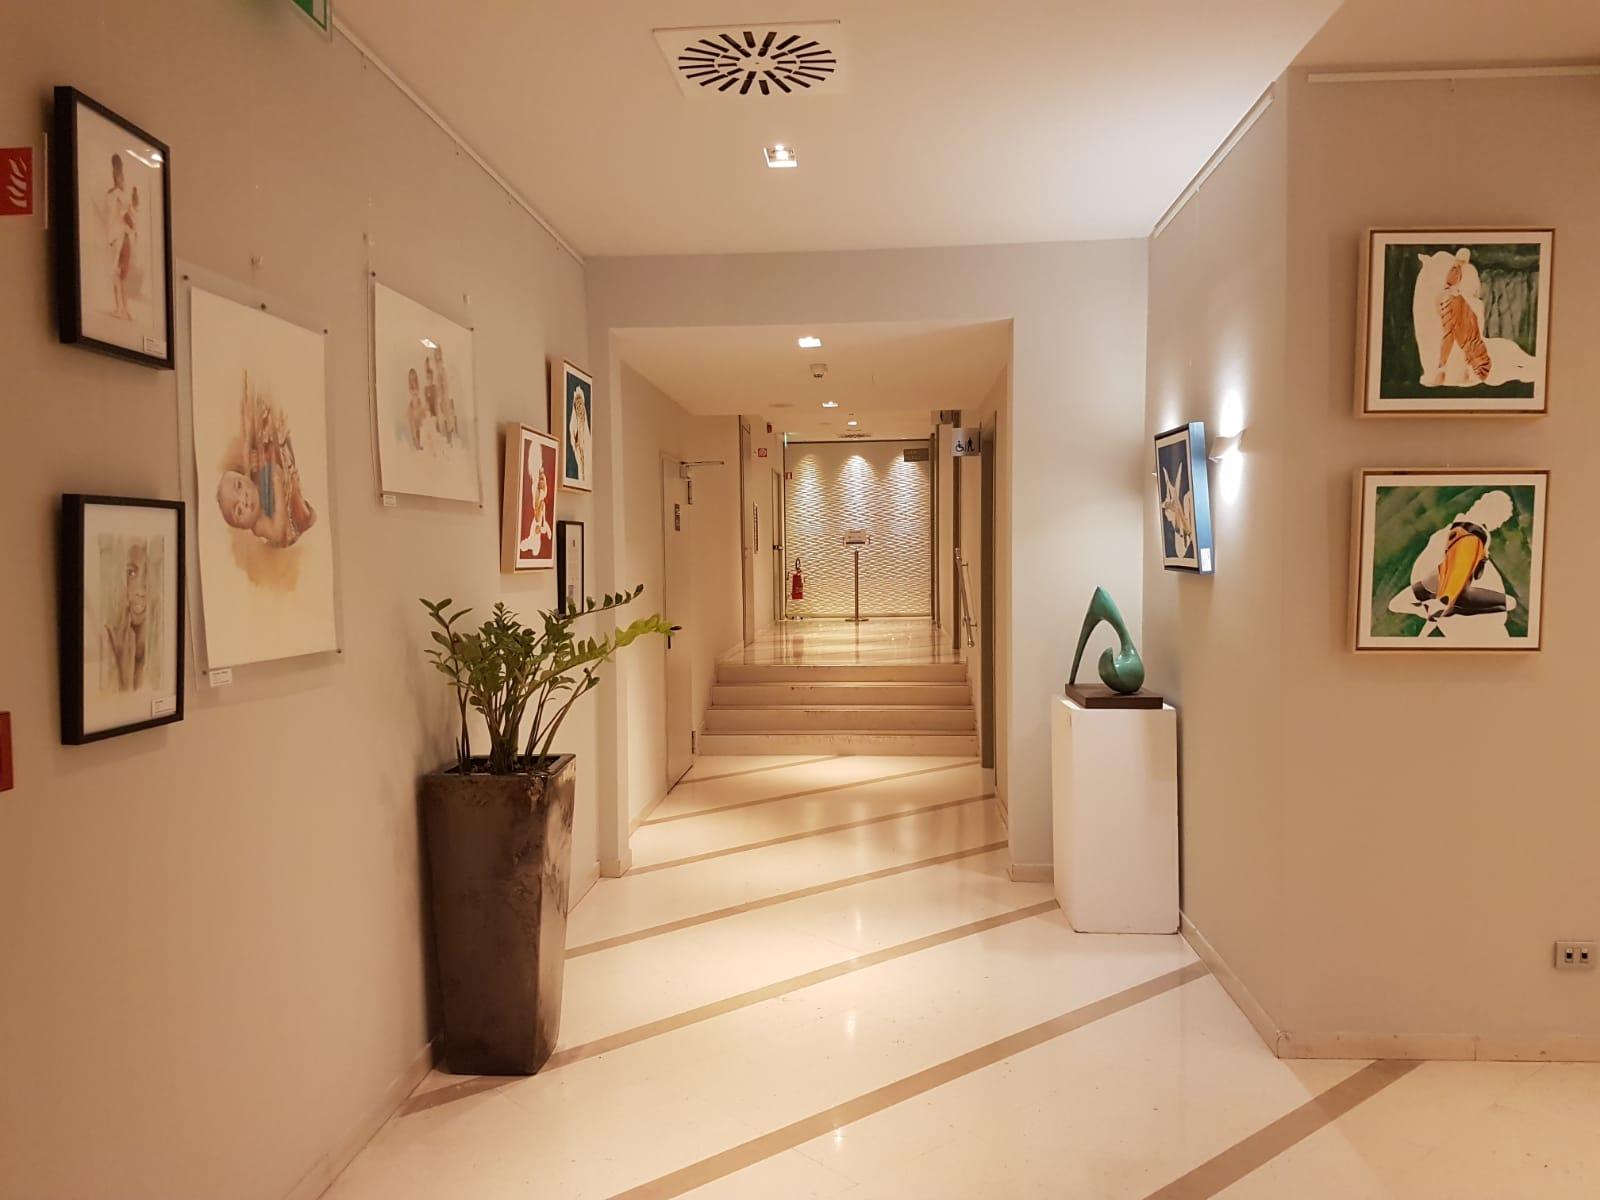 Vito Lentini Designer NH Hotel Touring Exhibition